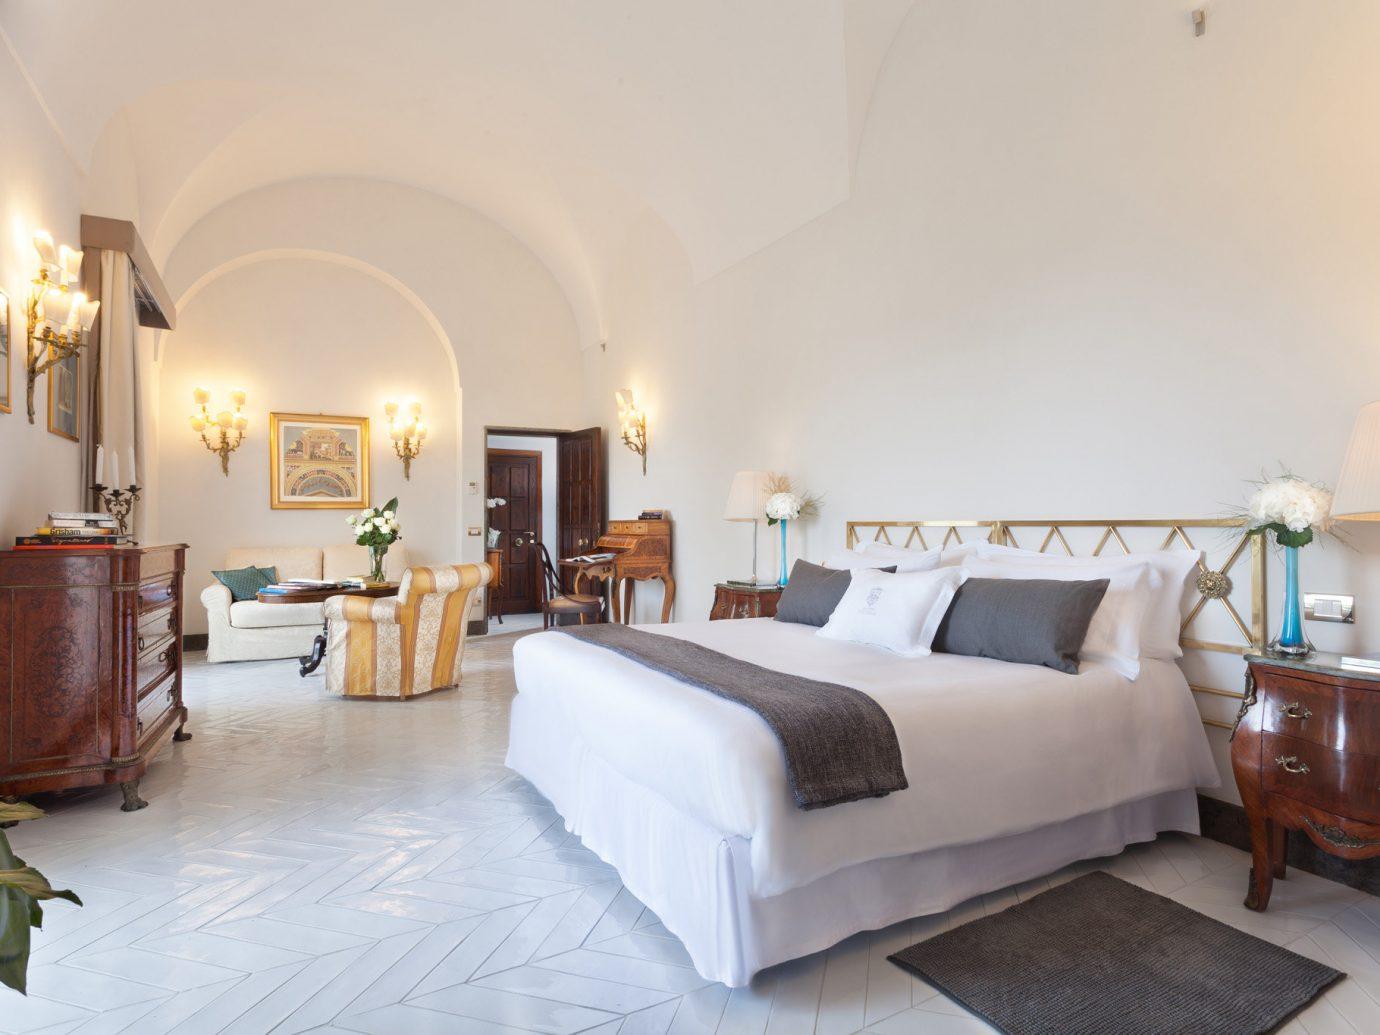 Bedroom at Grand Hotel Cocumella